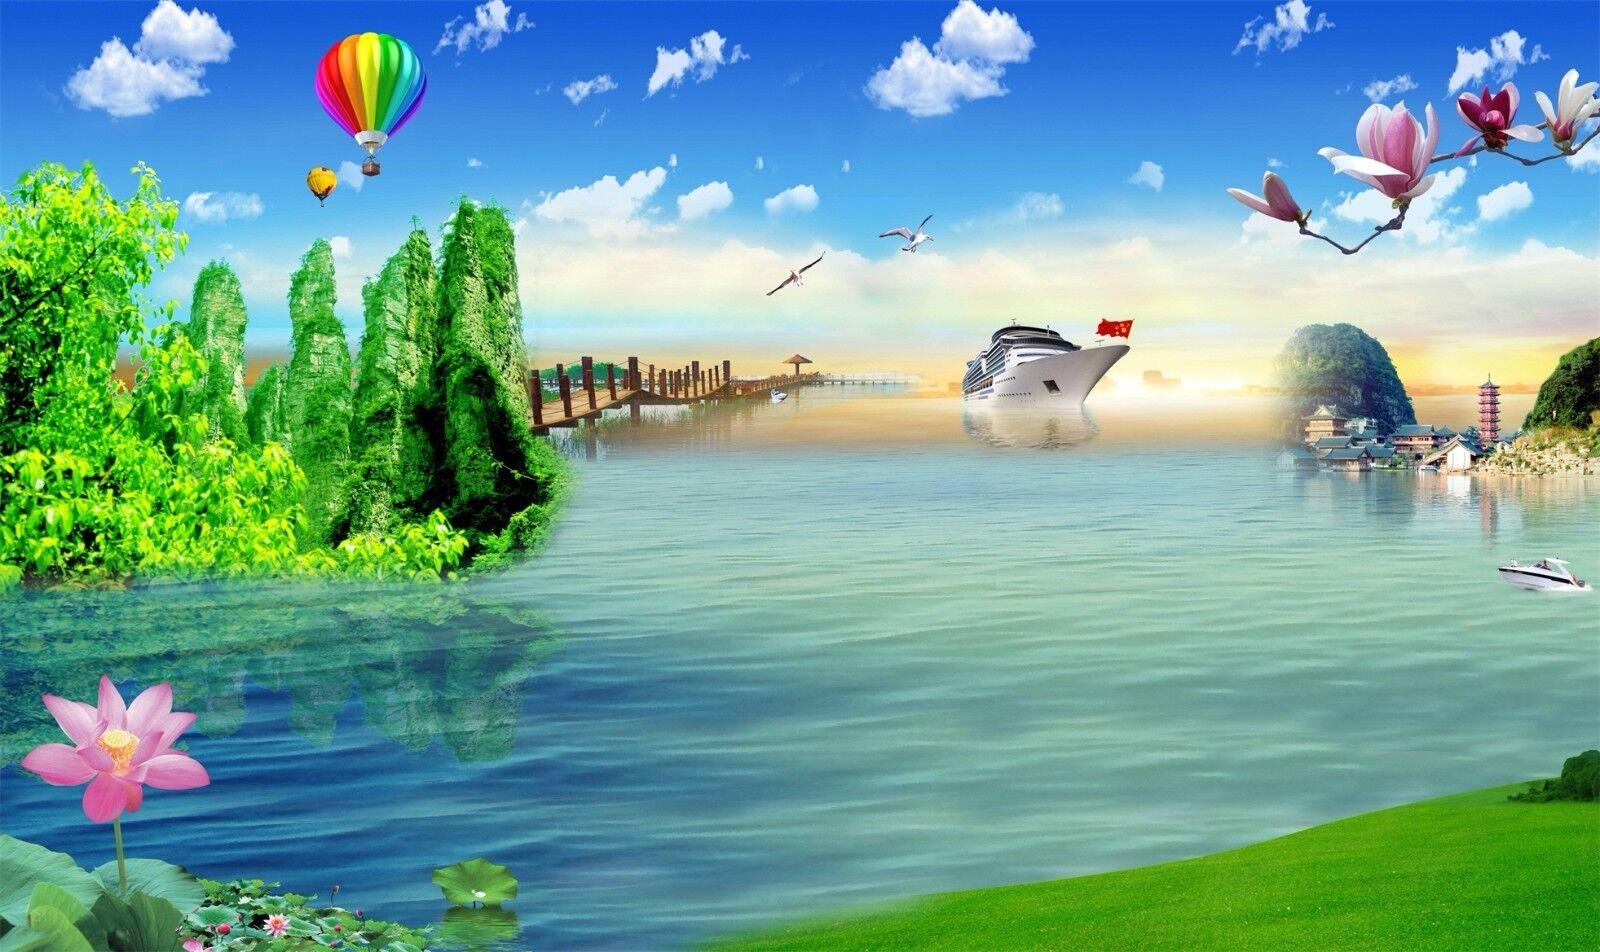 3D Himmel Himmel Himmel See Wälder 8936 Tapete Wandgemälde Tapeten Bild Familie DE Jenny  | Haltbar  | Günstige Bestellung  | Modern  acaa7d